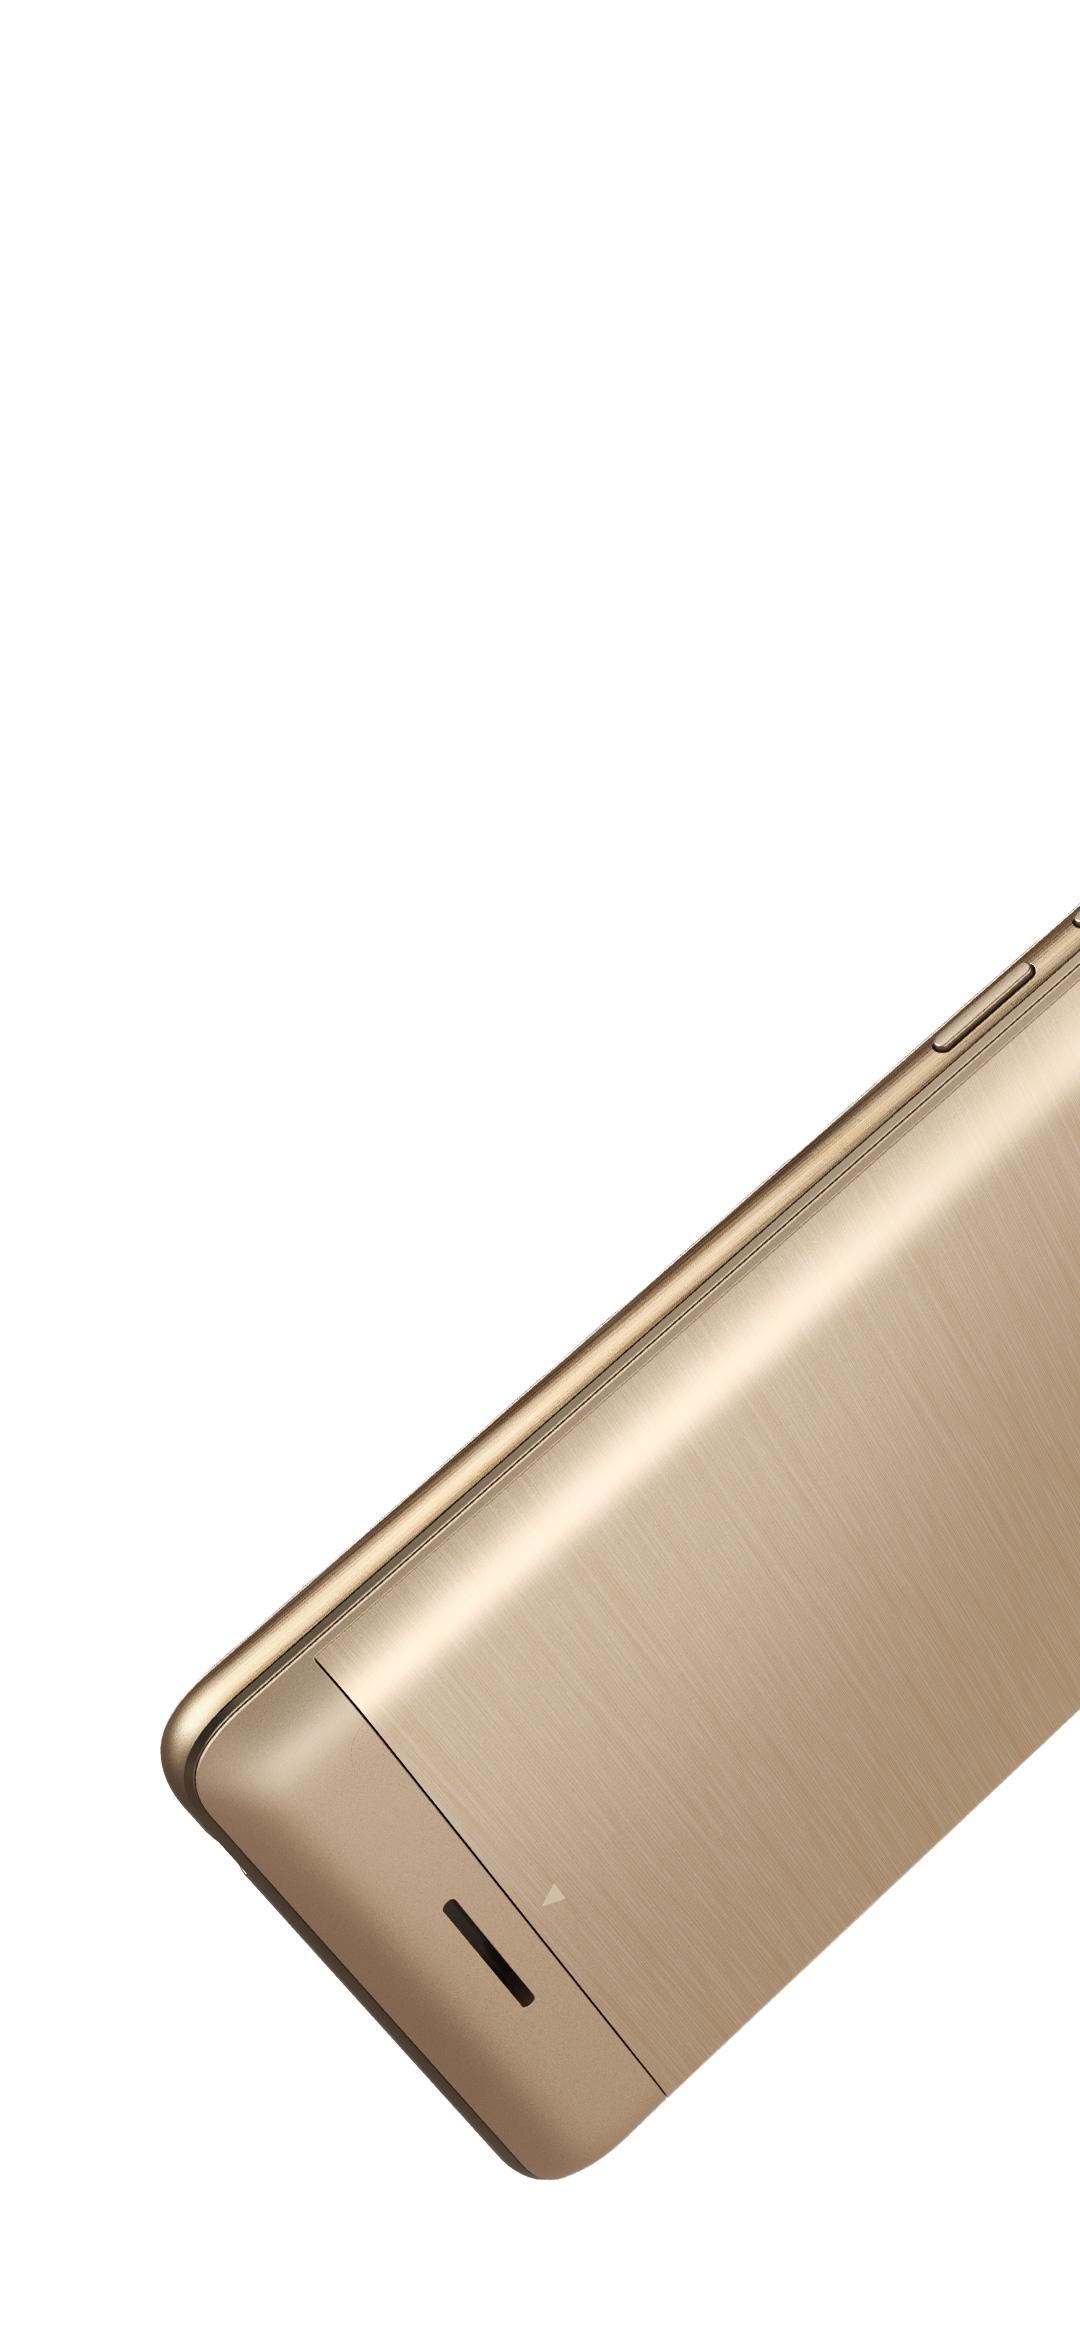 TECNO Long Standby L8, Quality Loudspeaker